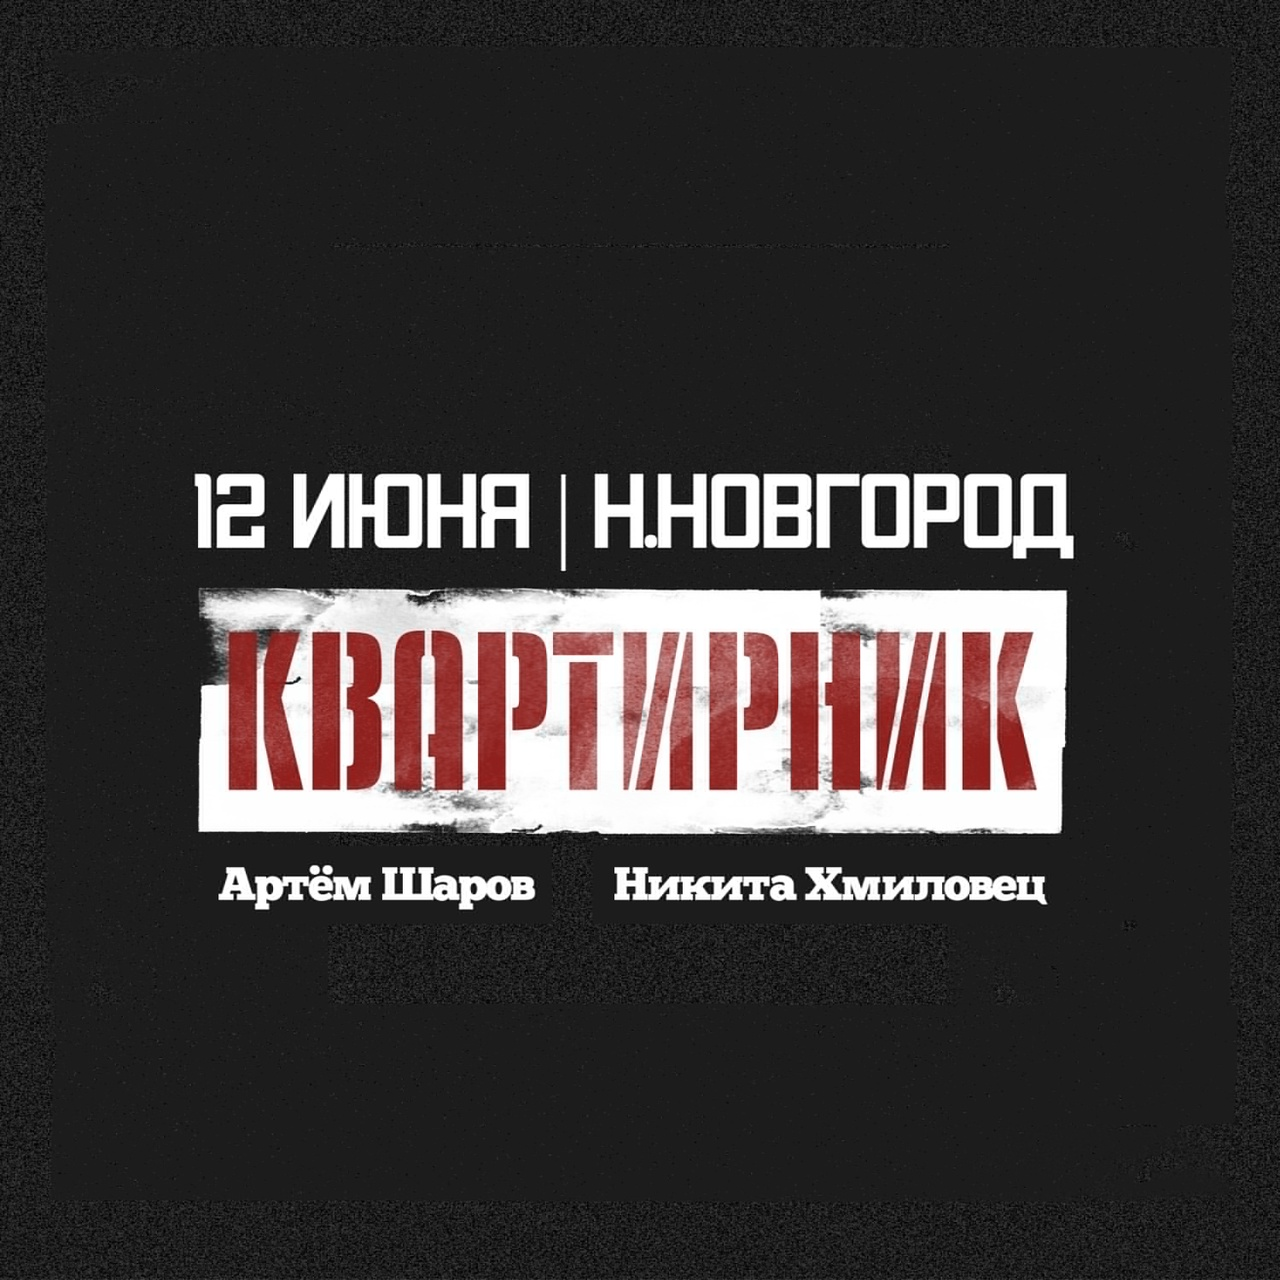 Афиша Нижний Новгород 12.06 / Квартиник с ГУДТАЙМС / HARAT'S PUB